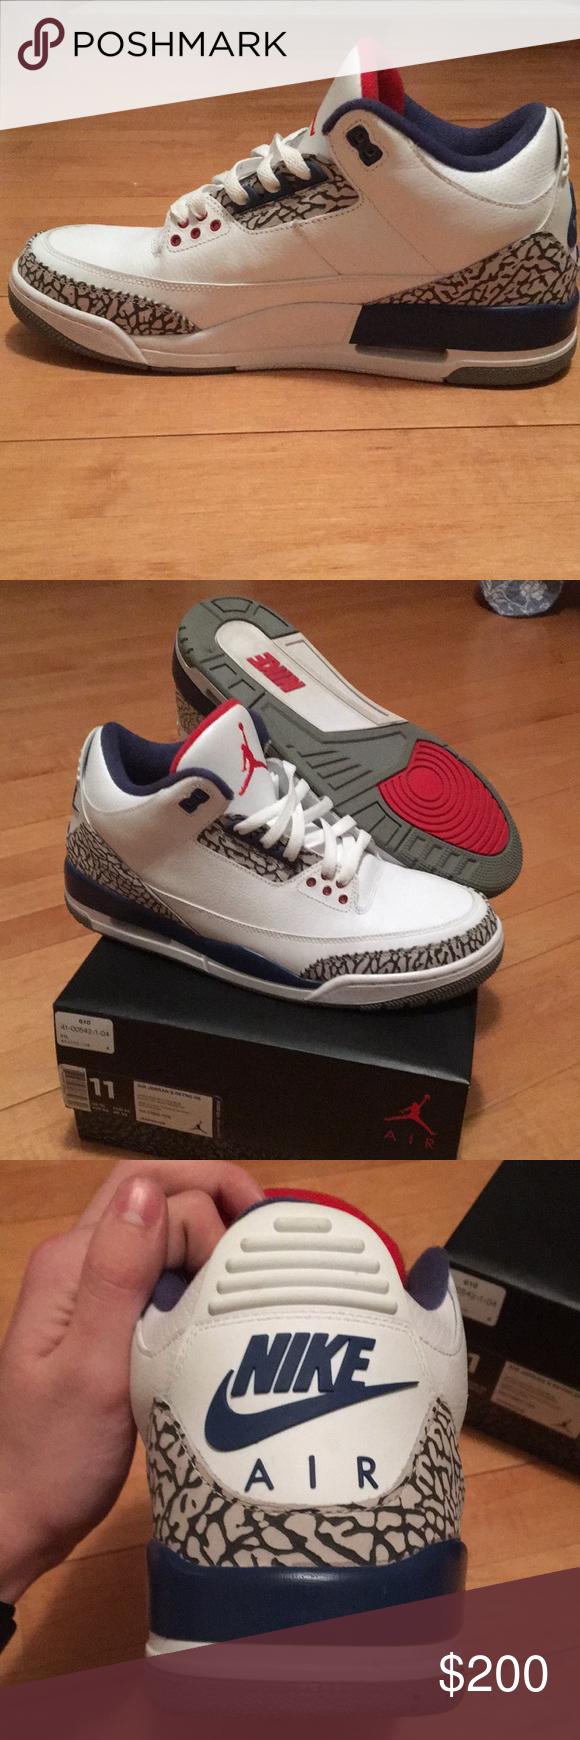 Air Jordan 3 retro true blue 2016 Like new worn twice